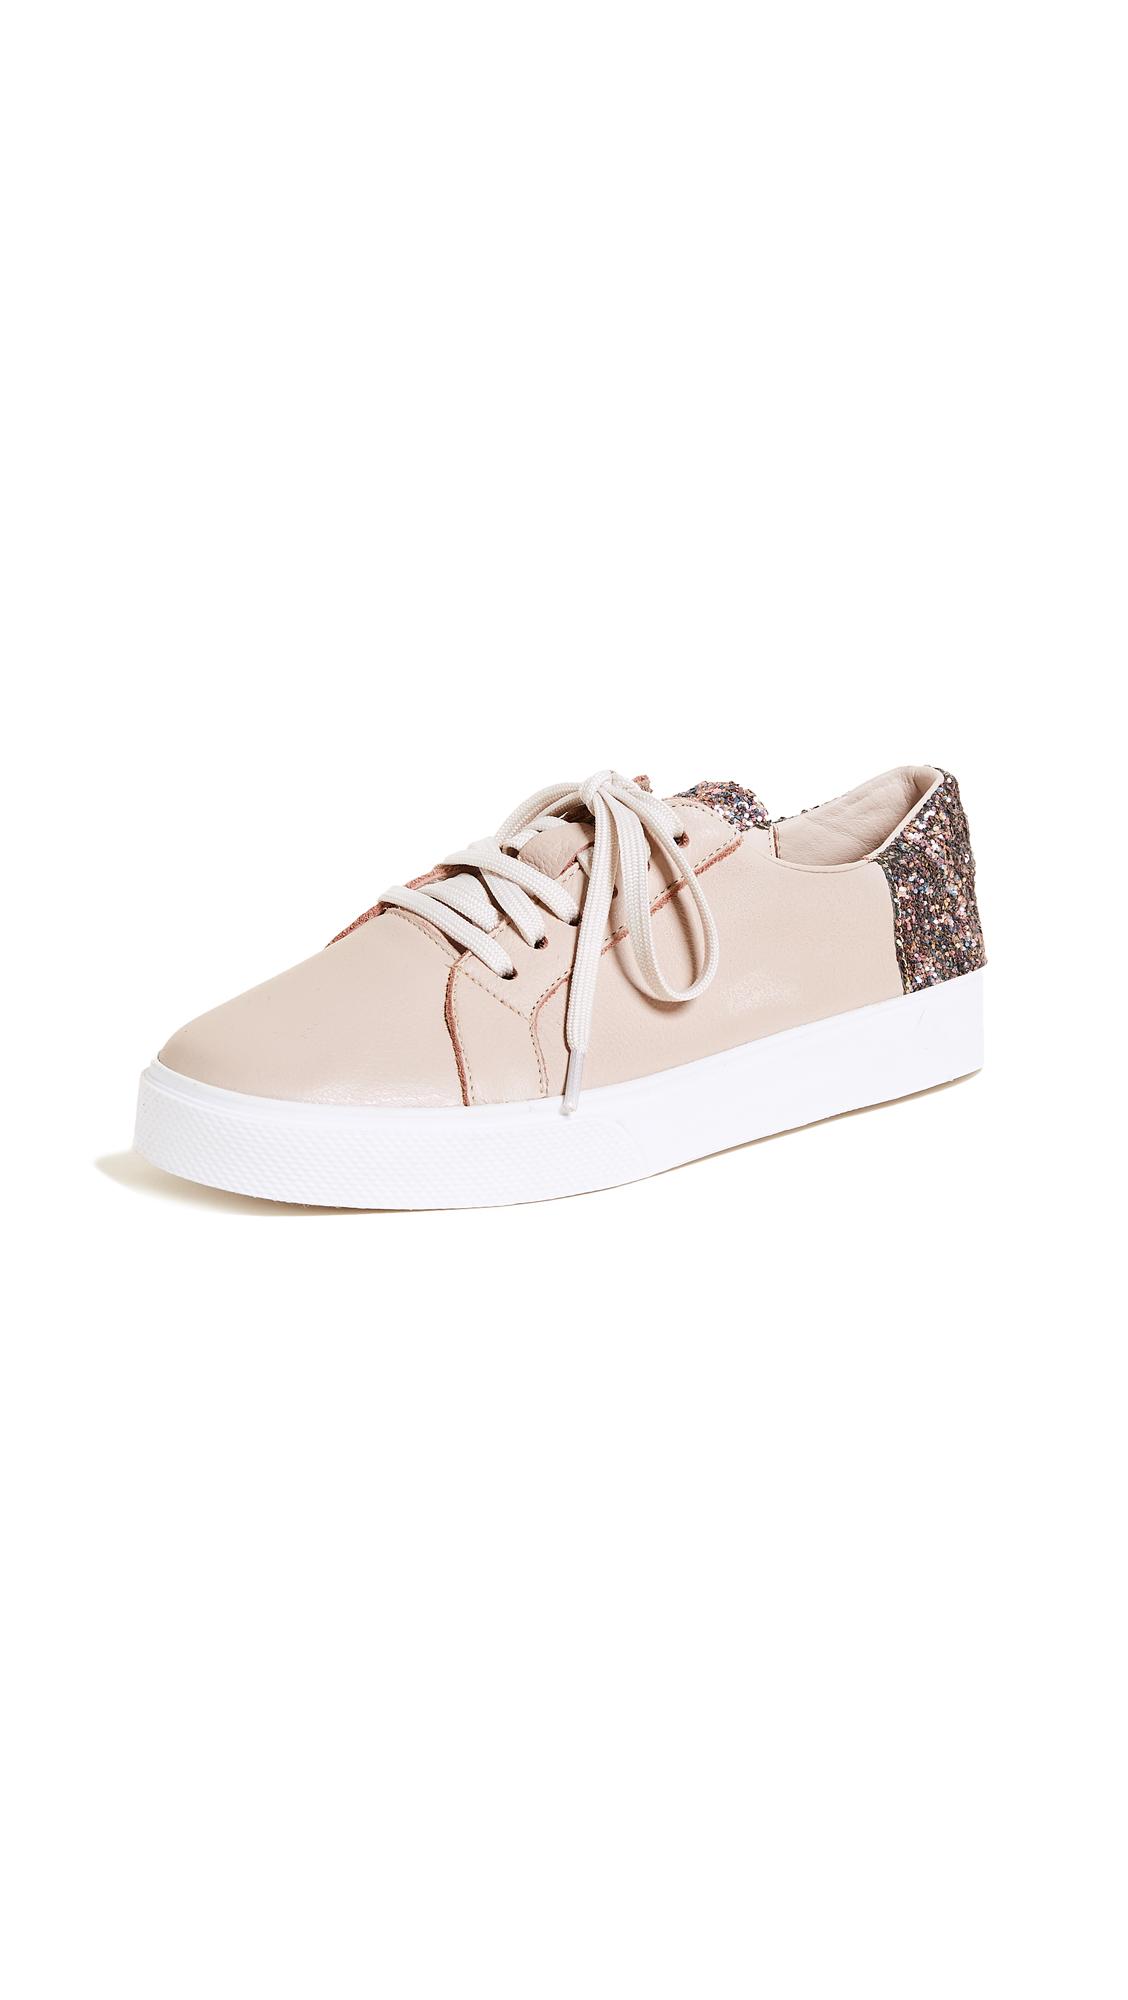 KAANAS San Rafael Sneakers - Nude